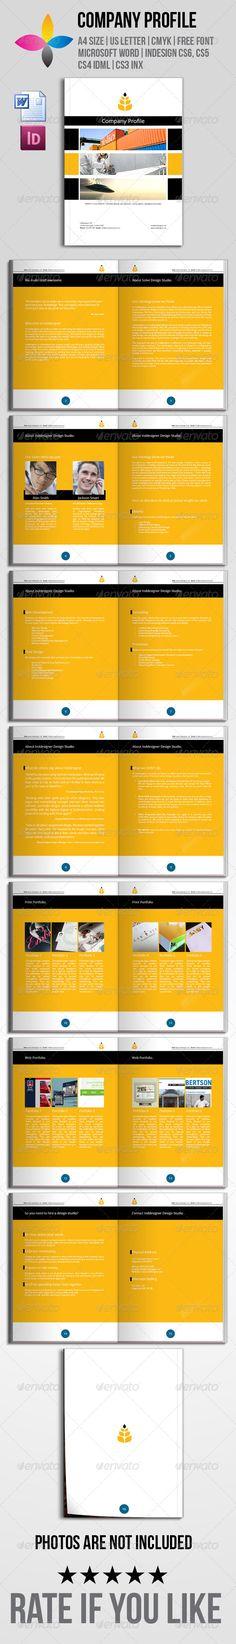 Company Profile (12 Pages) Company profile, Corporate identity - company profile templates word